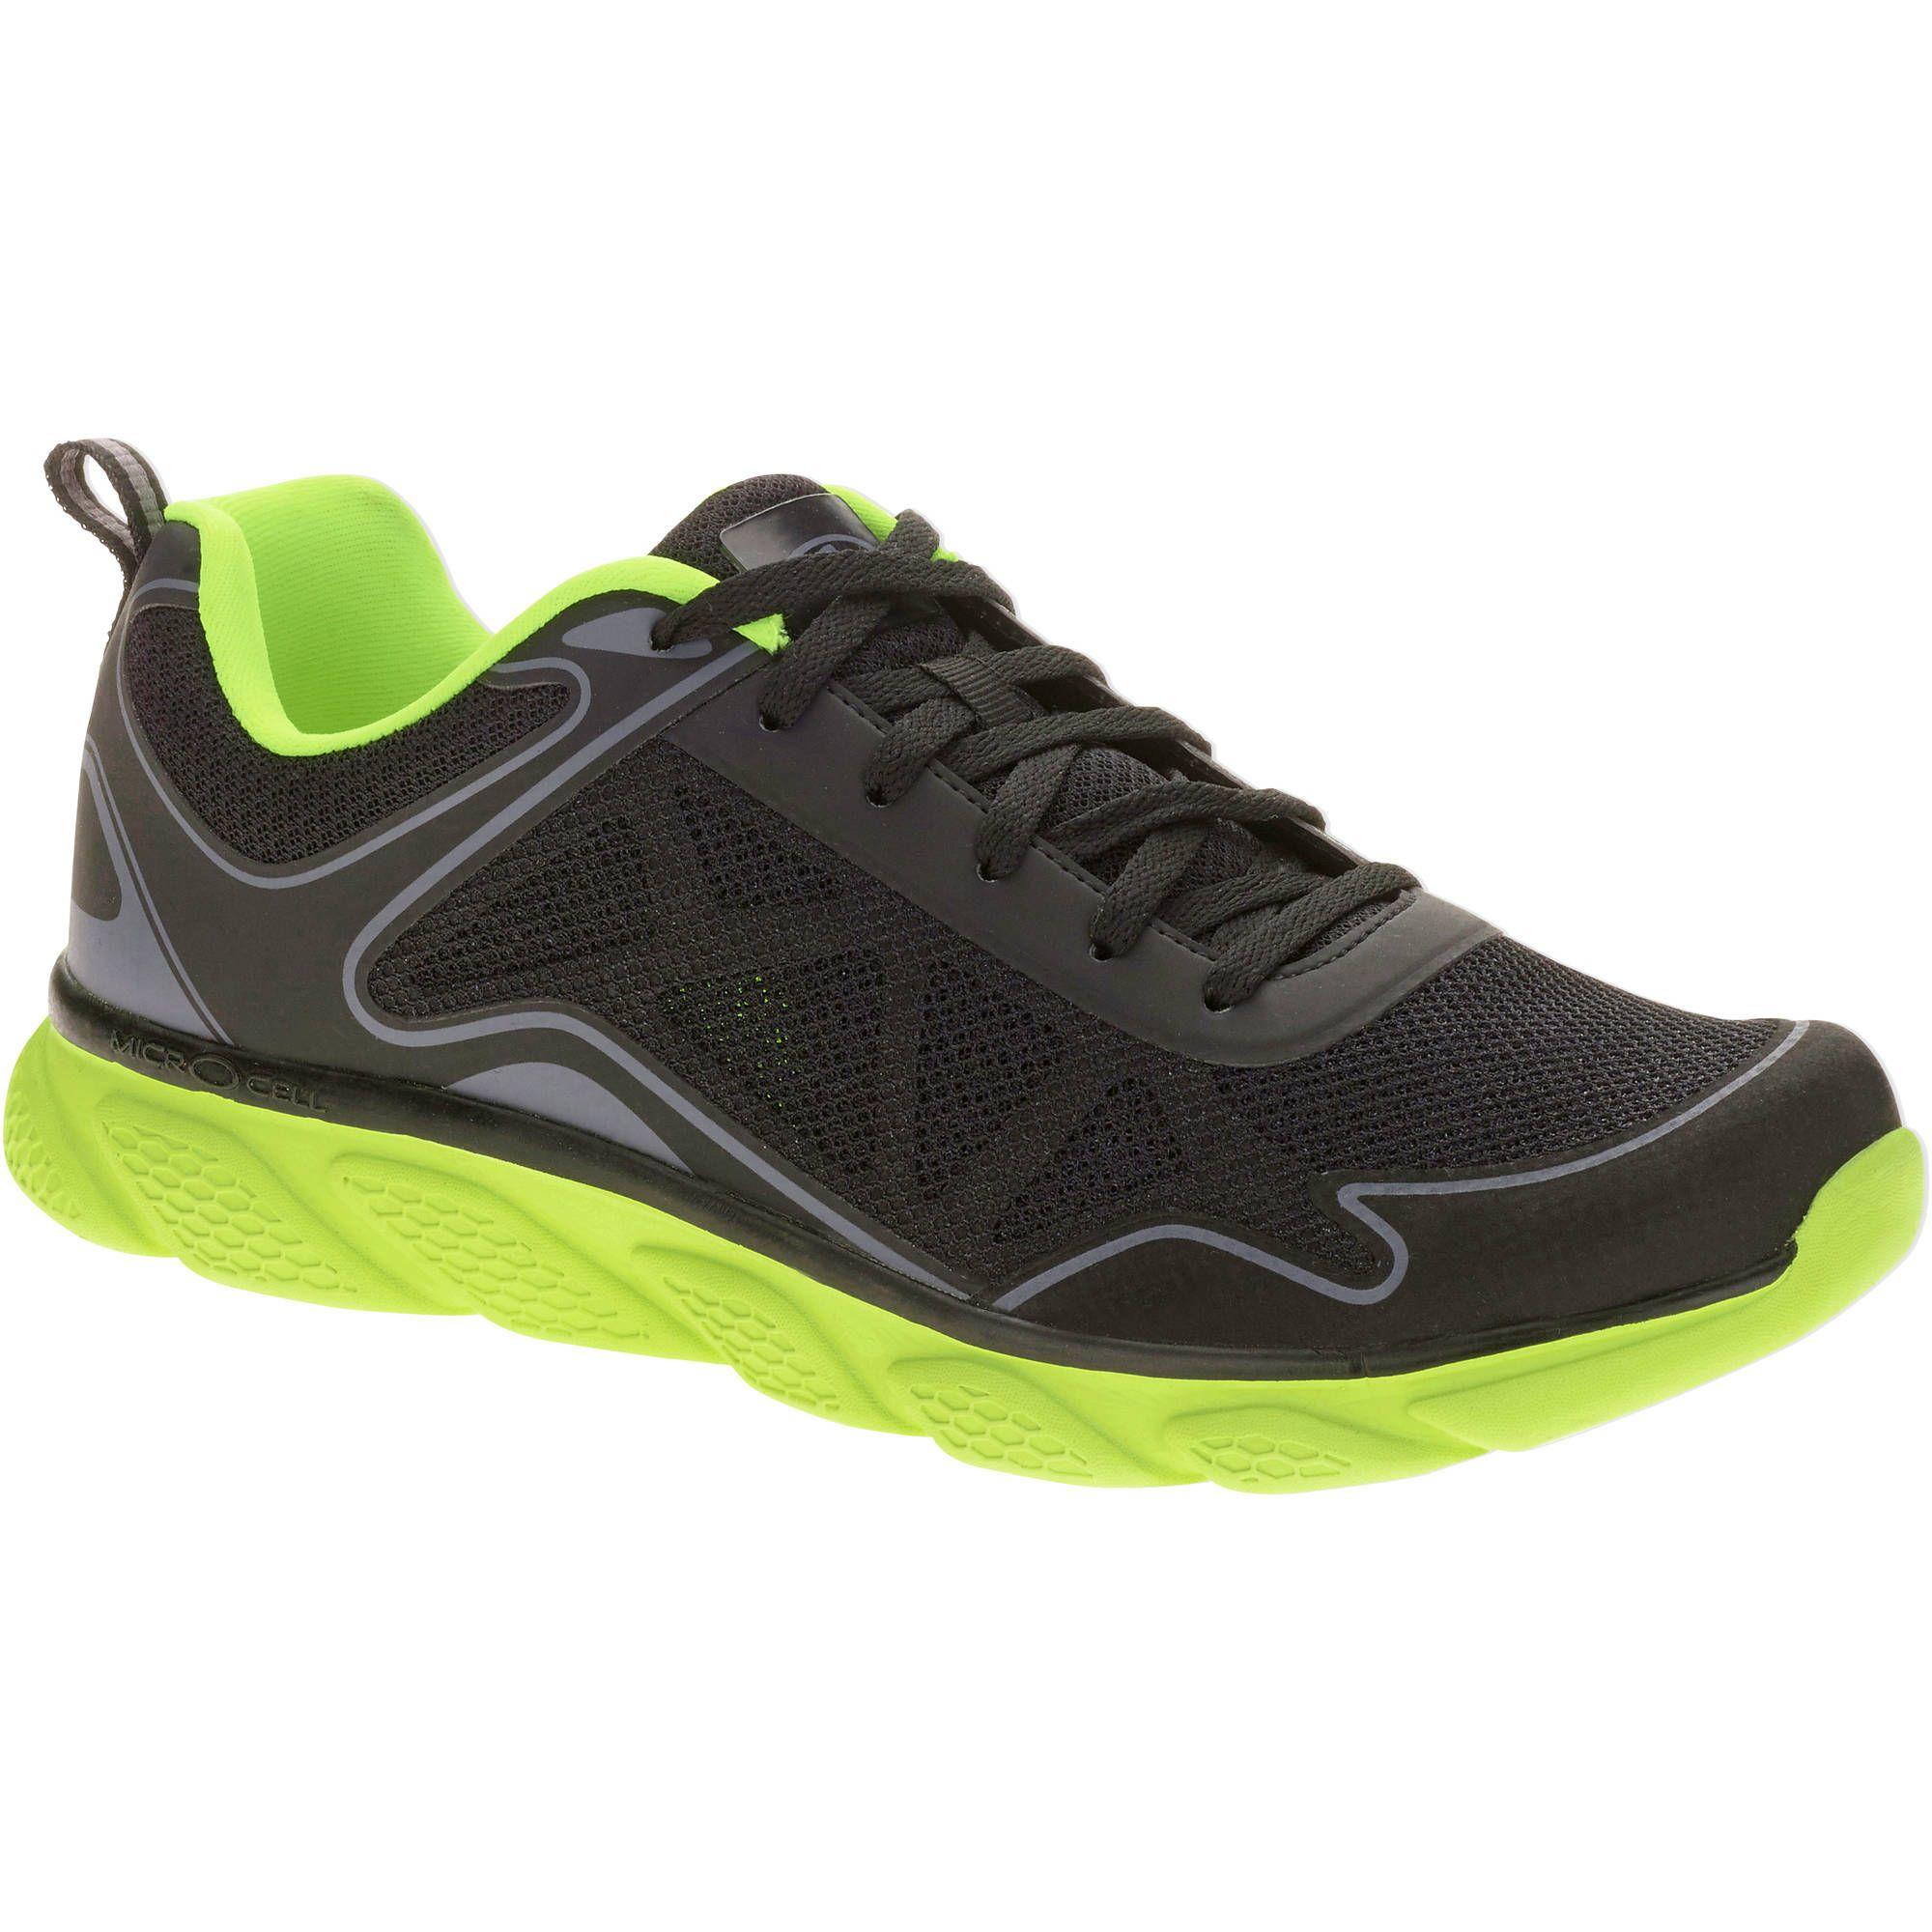 Athletic Works Men S Mesh Jogger Athletic Shoe Walmart Com Shoes Athletic Shoes Athletic Works [ 2000 x 2000 Pixel ]